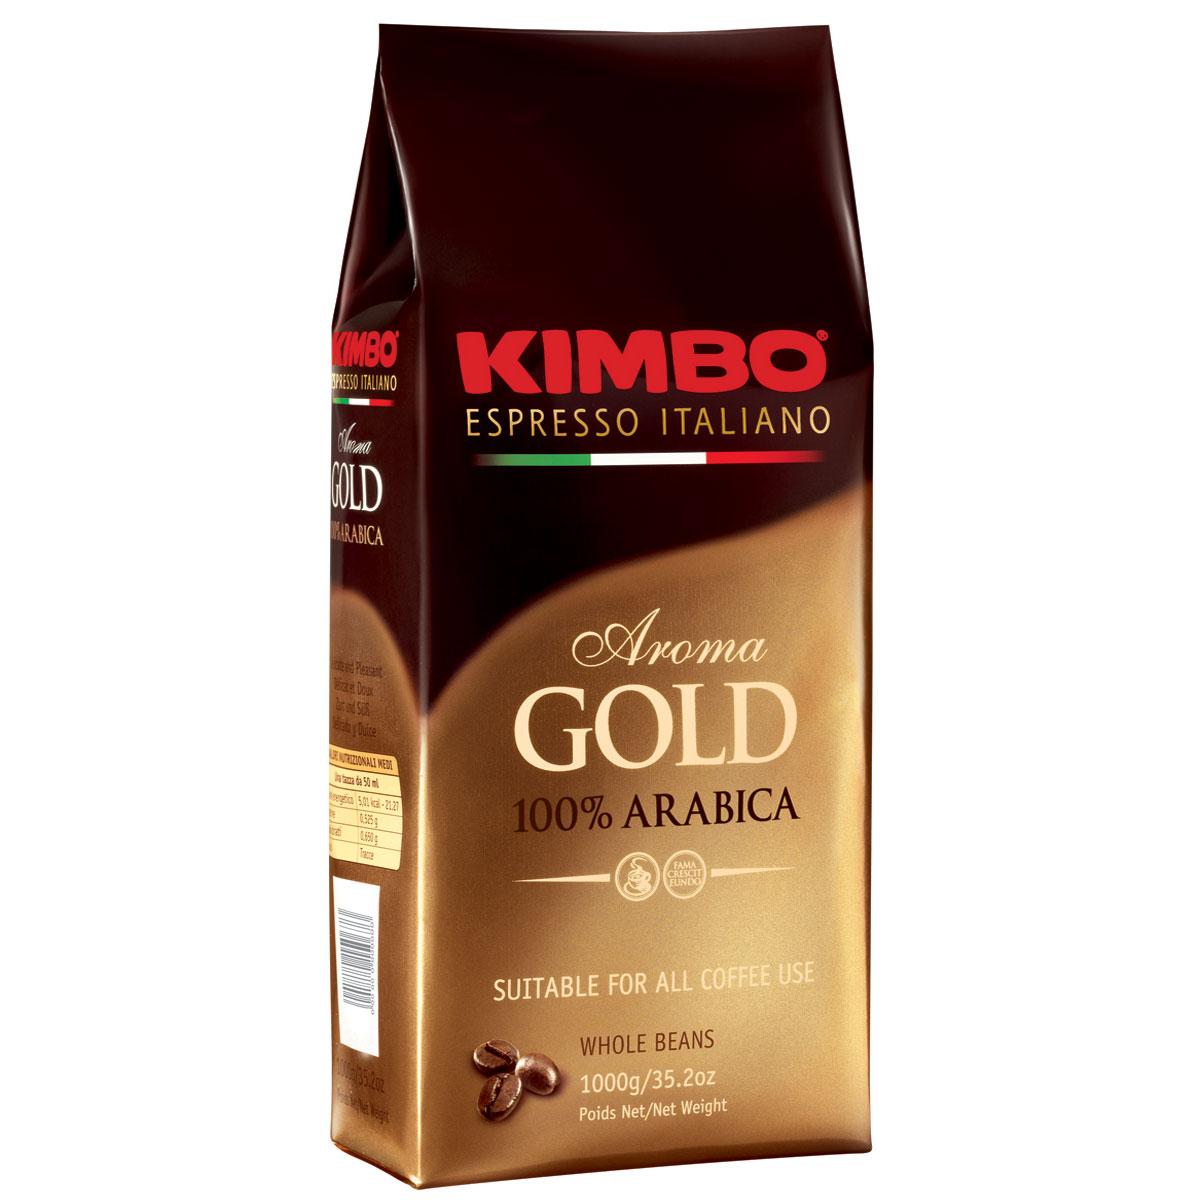 Kimbo Aroma Gold 100% Arabica кофе в зернах, 1 кг pausa aroma bar кофе в зернах 1 кг